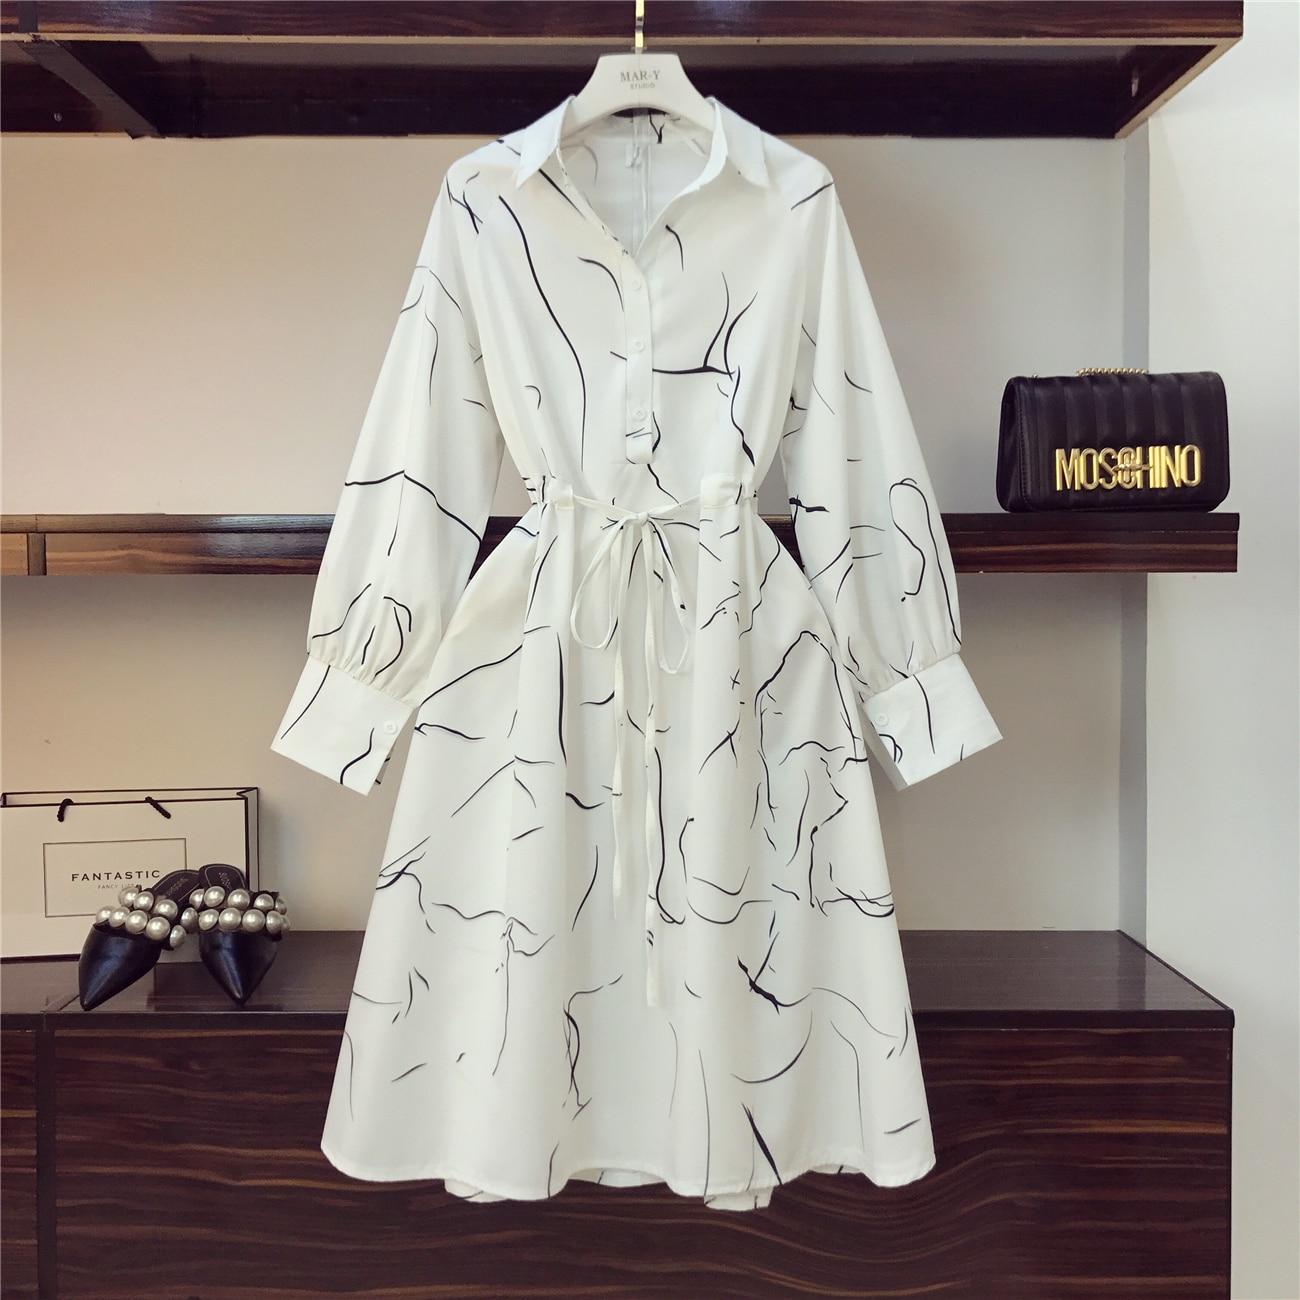 2019 Spring Summer New Fashion Immortal Retro Shirt Dress Womens Printed Mid Long Dress Girls Holiday Bohemian Dresses Femme Women's Clothing